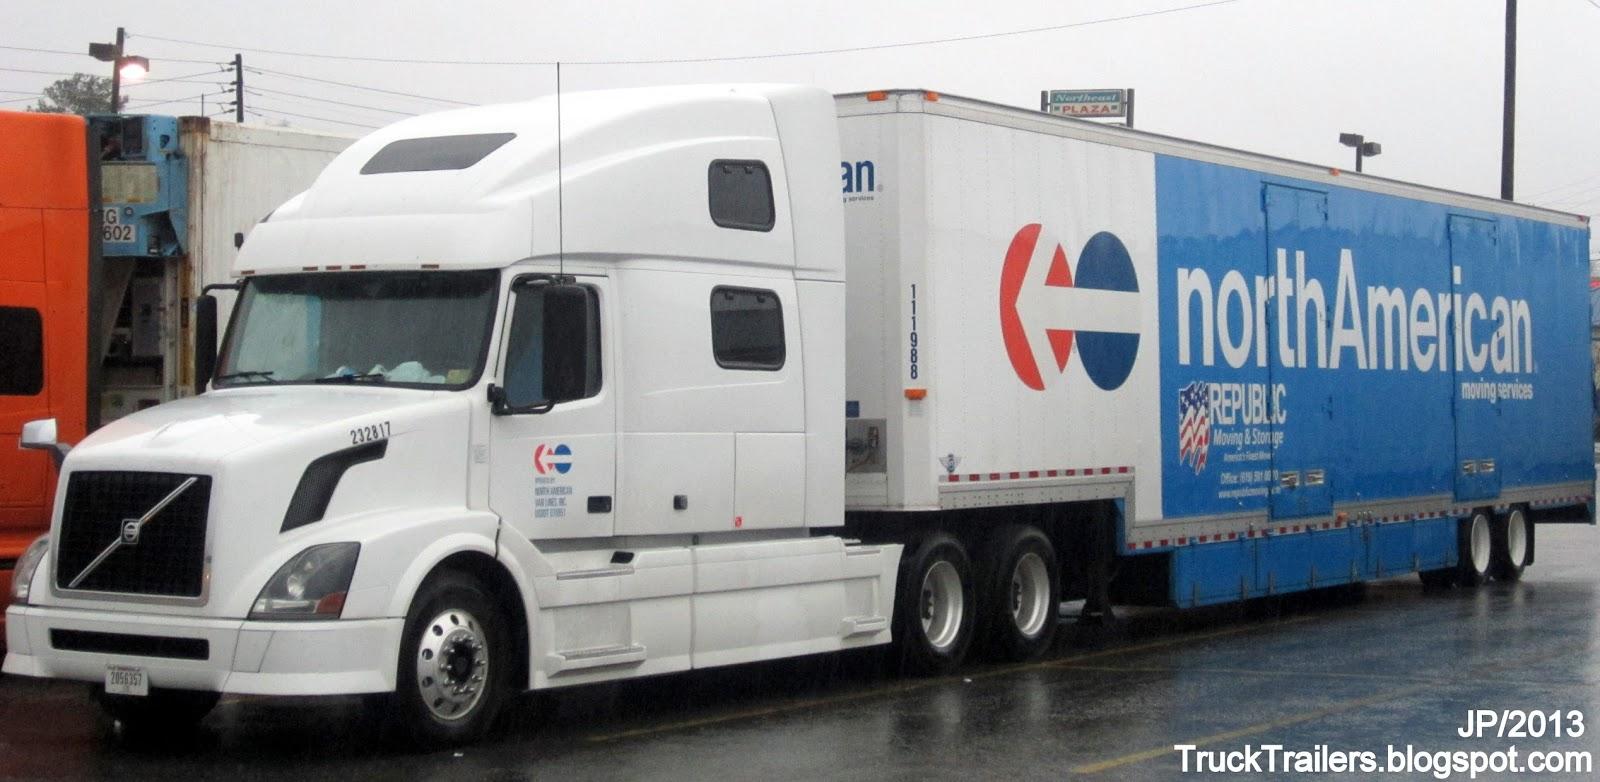 NORTH AMERICAN VAN LINES Inc. VOLVO Sleeper Cab Truck, Moving Van Trailer Republic  Moving U0026 Storage Chula Vista California North American Moving Services